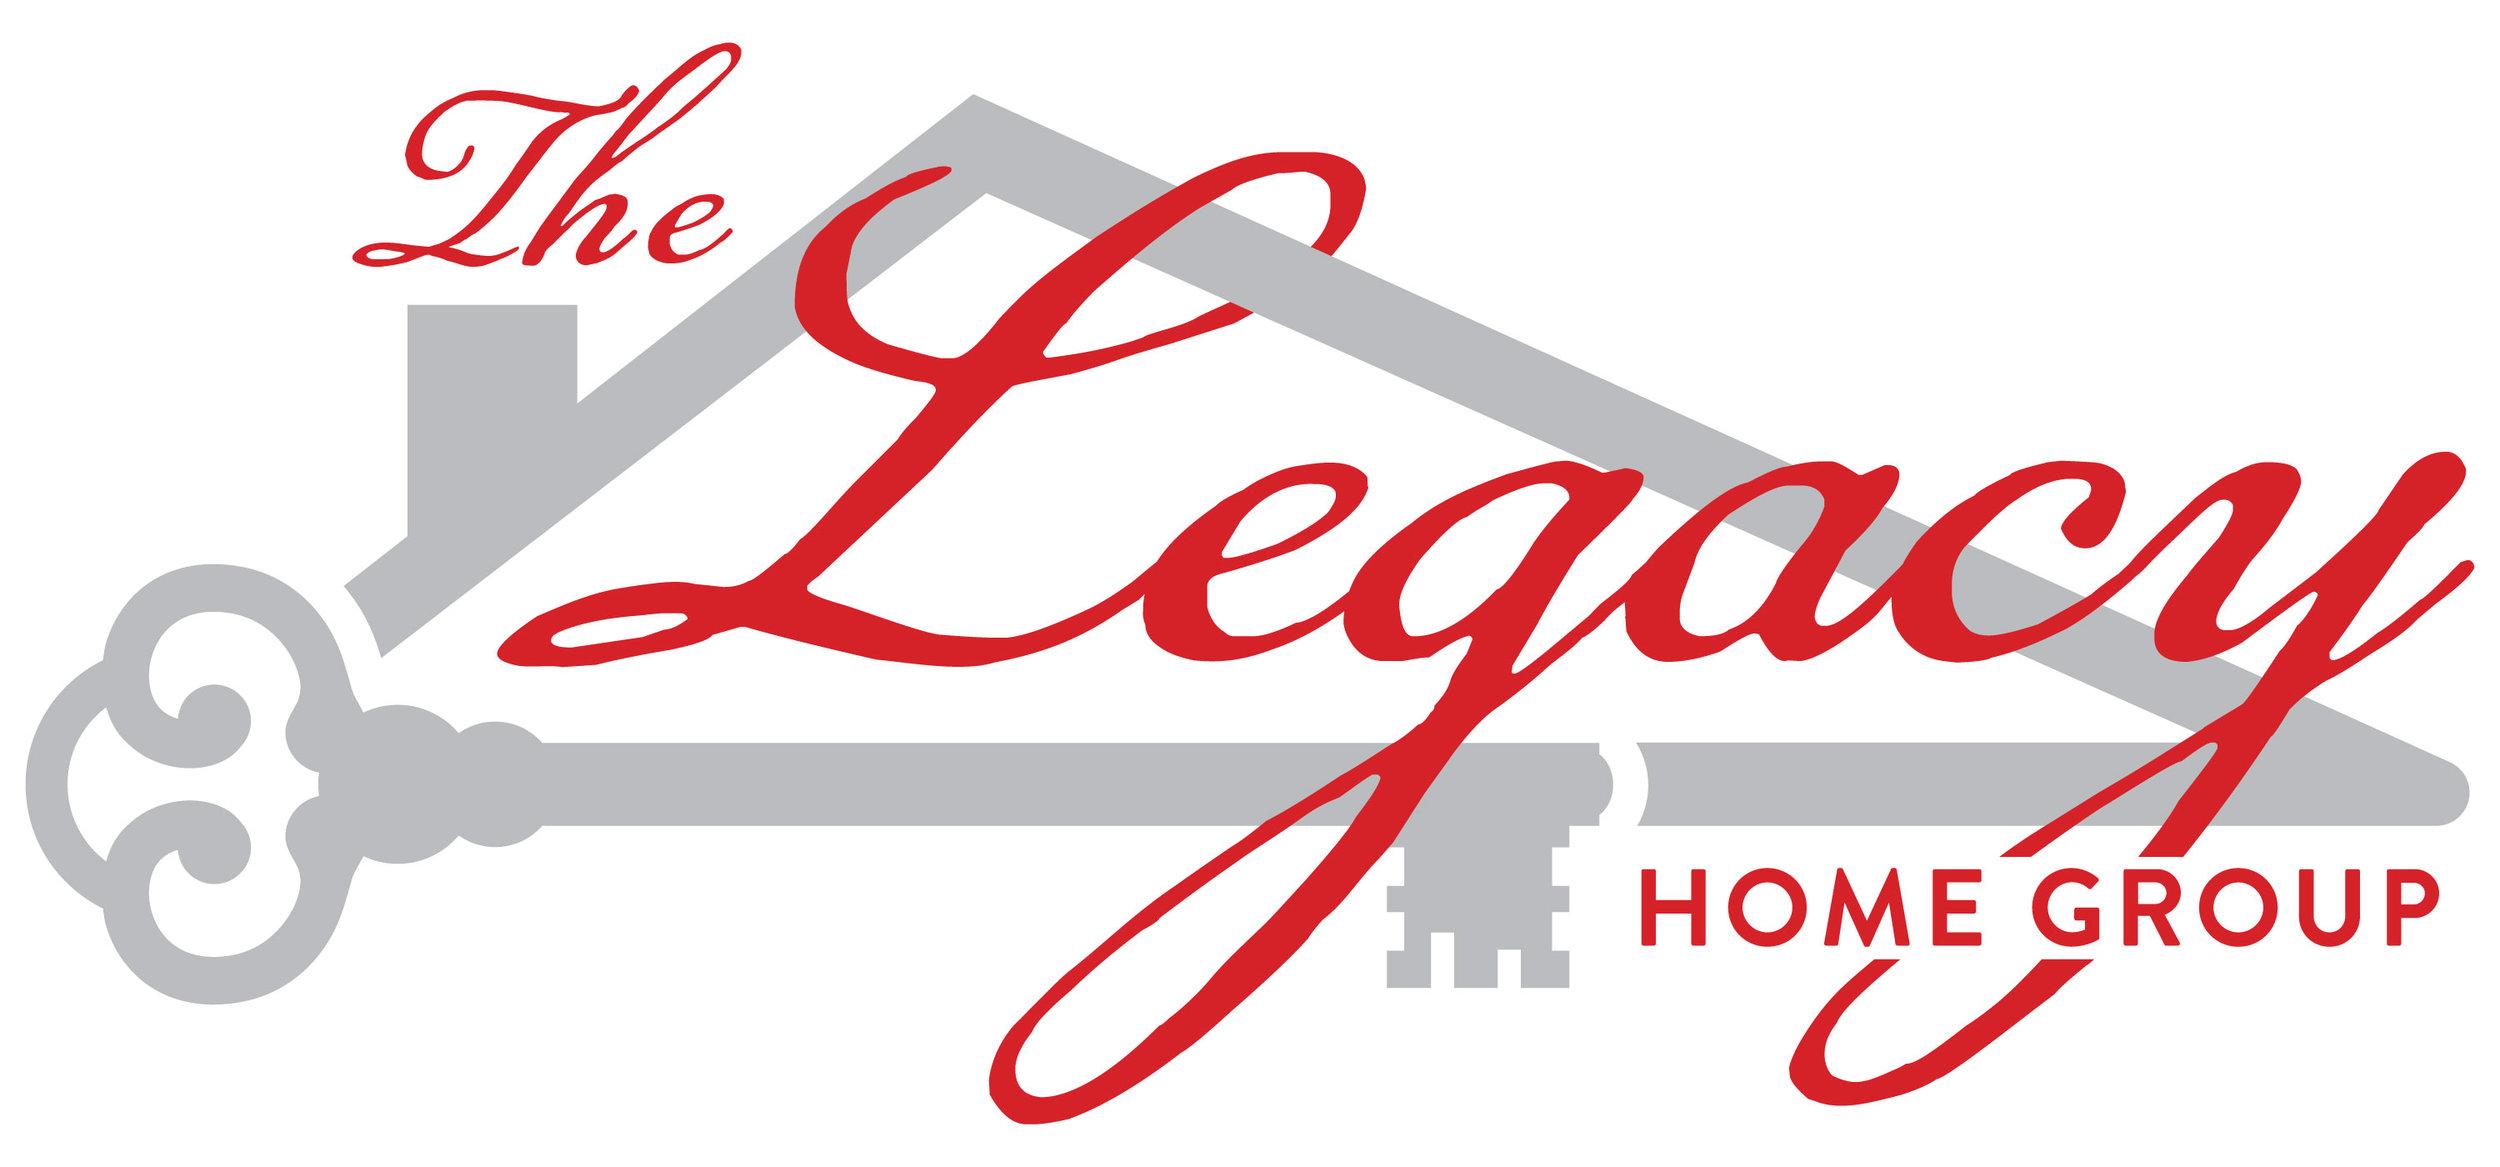 TheLegacyHomeGroup_logo_final.jpg